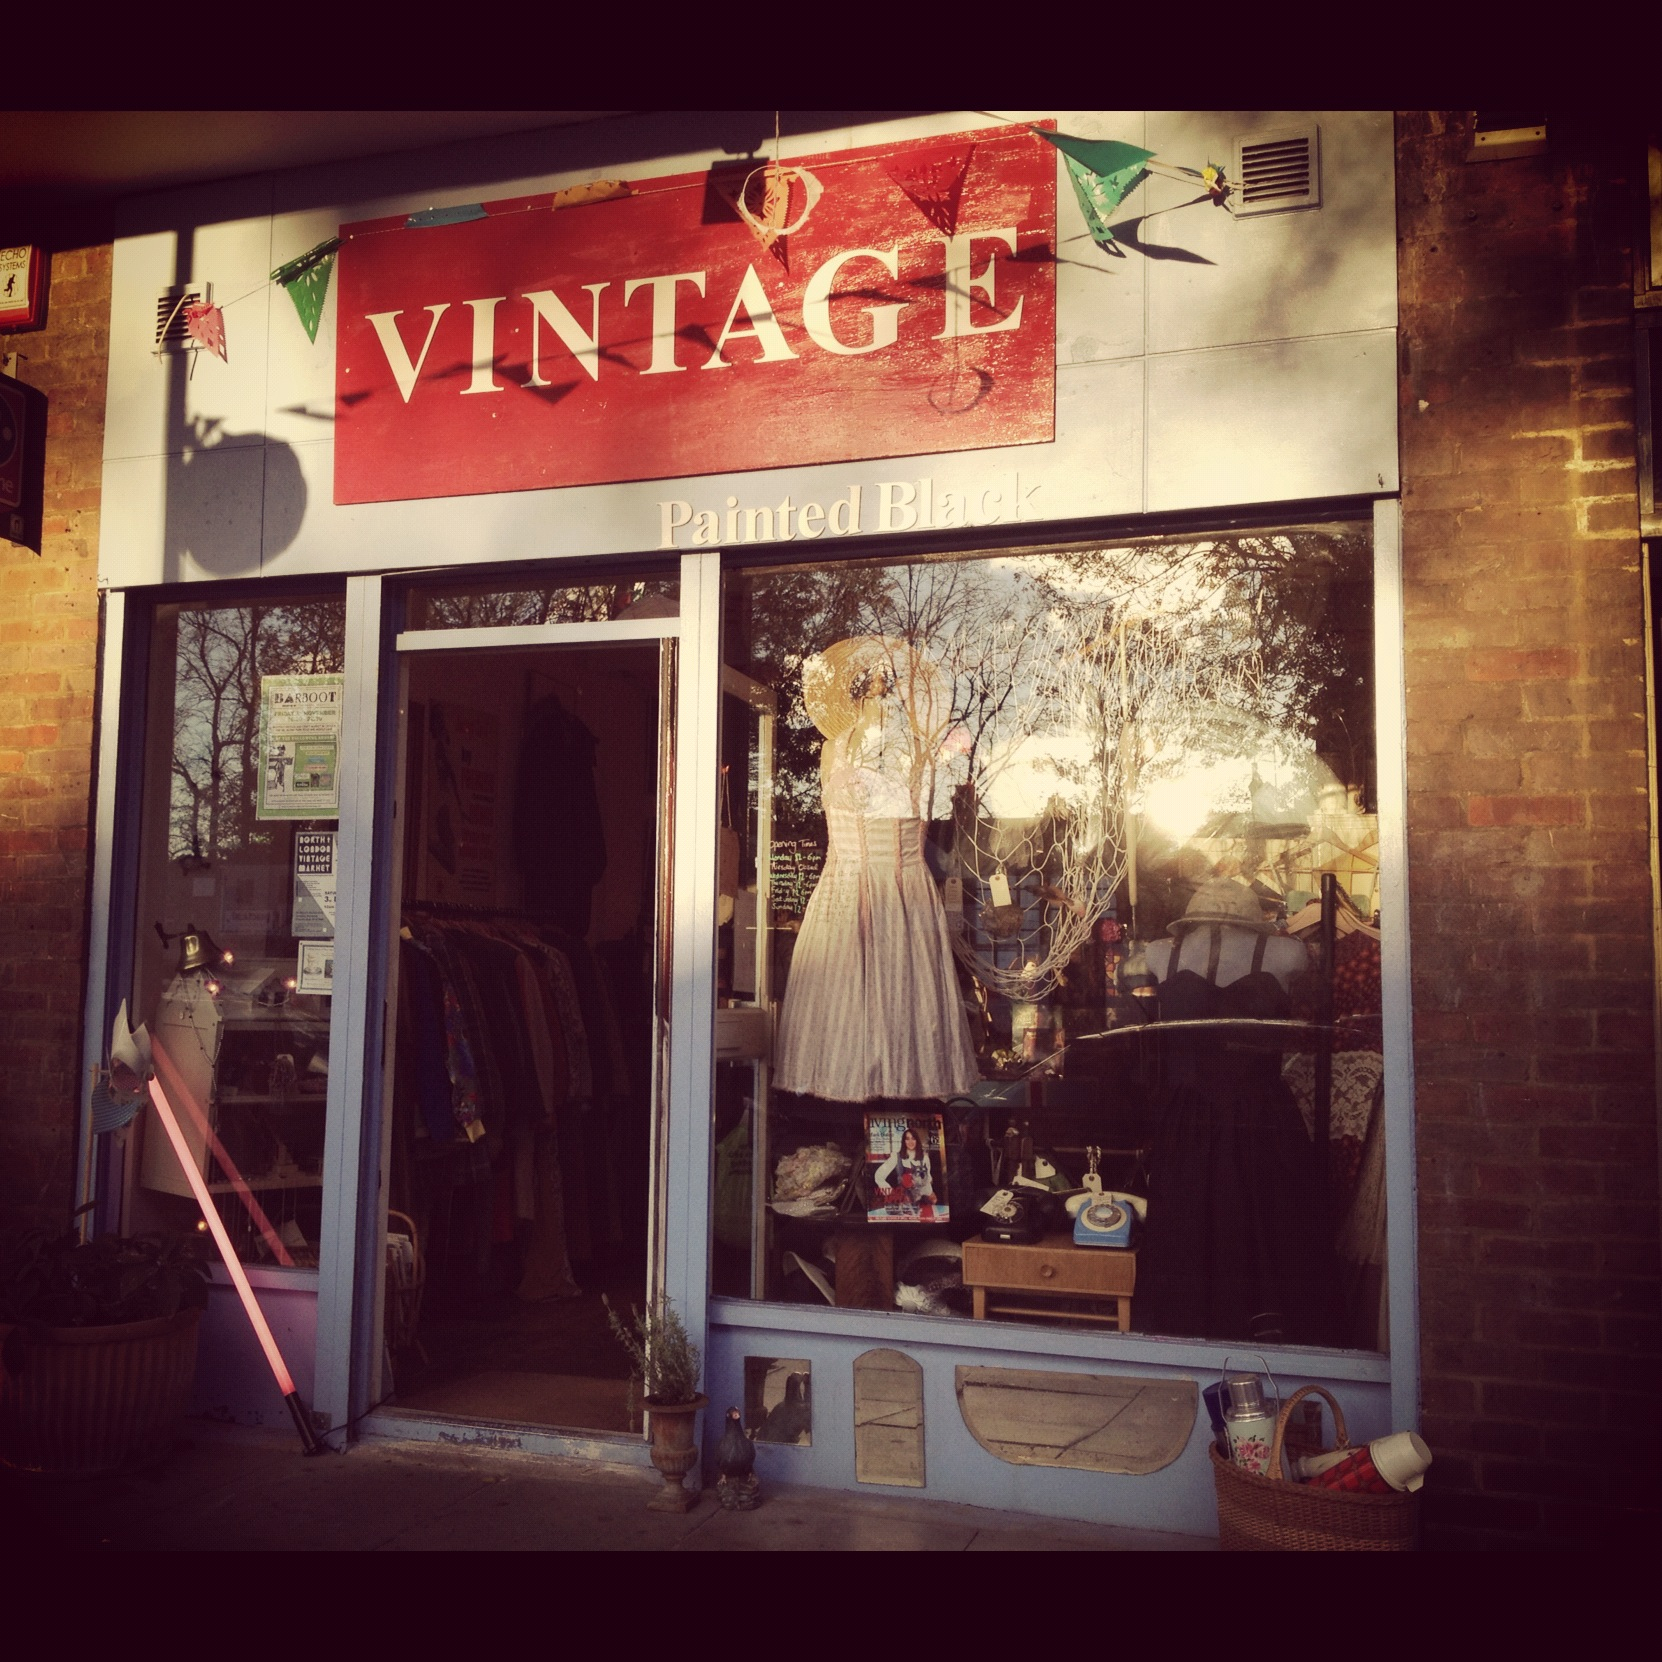 Painted Black vintage shop Crouch End